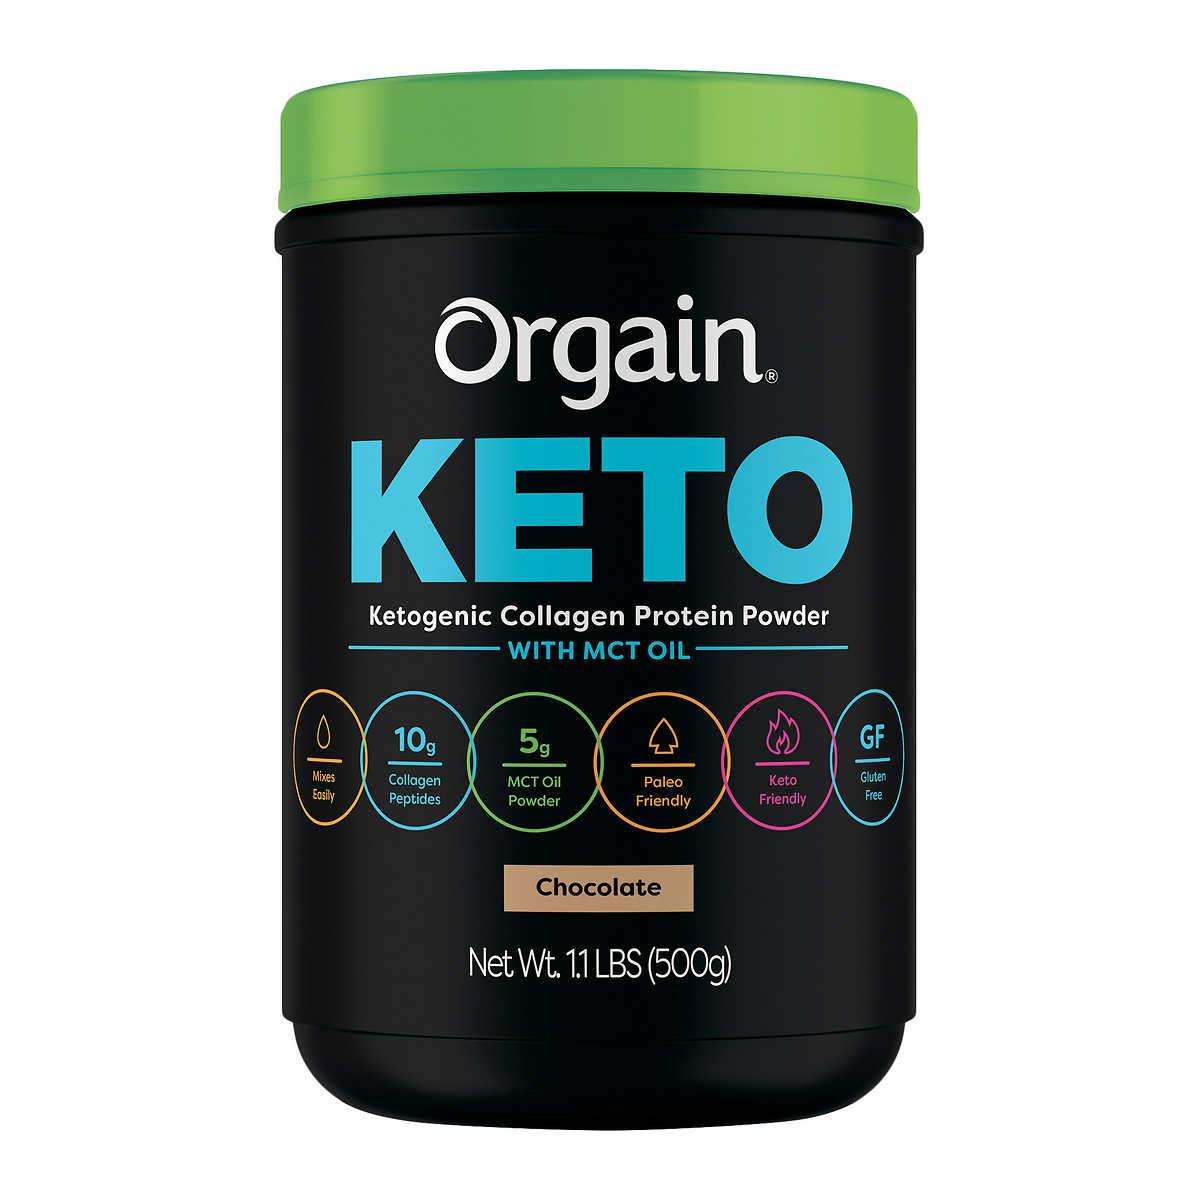 Orgain Keto Collagen Protein Chocolate, 1 1 lbs